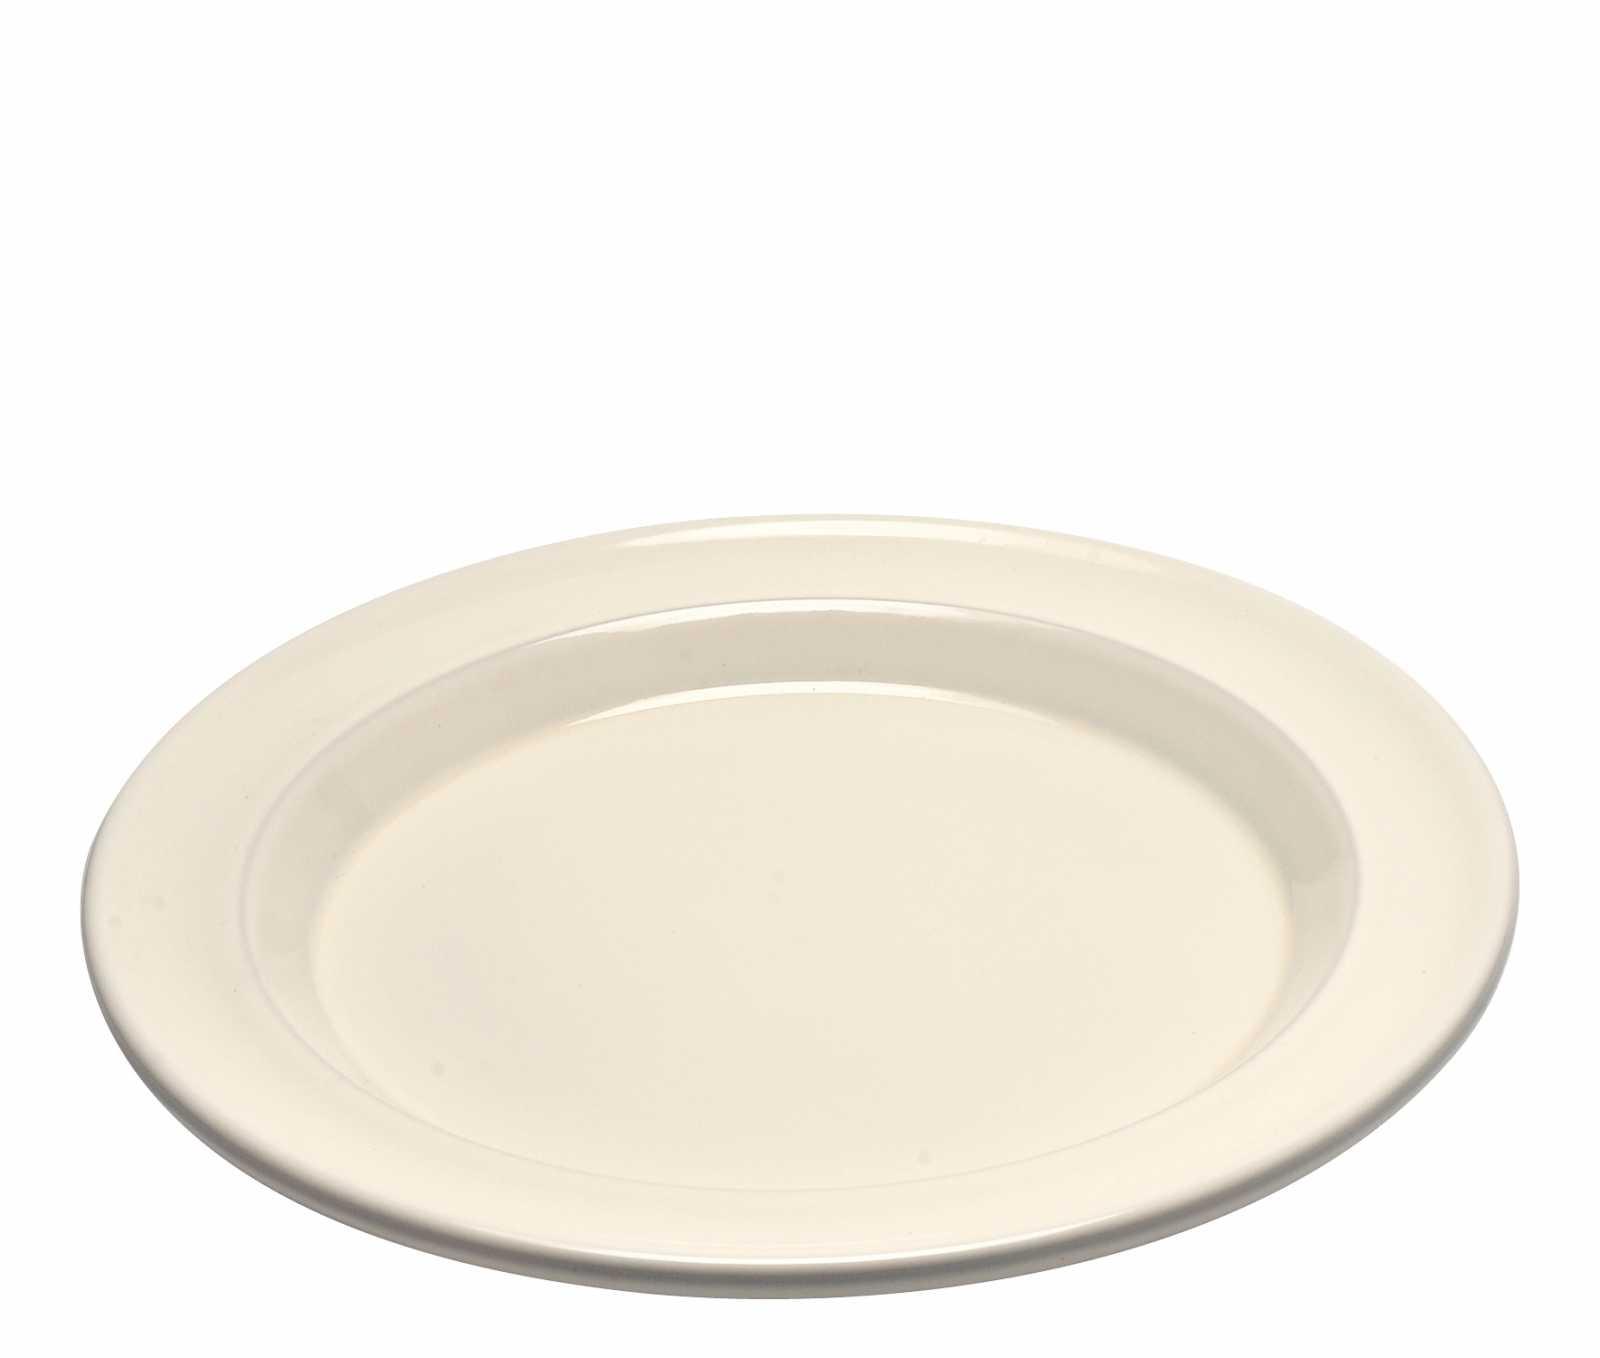 Онлайн каталог PROMENU: Тарелка сервировочная/подстановочная Emile Henry Tableware, 28 см, бежевая Emile Henry 028878